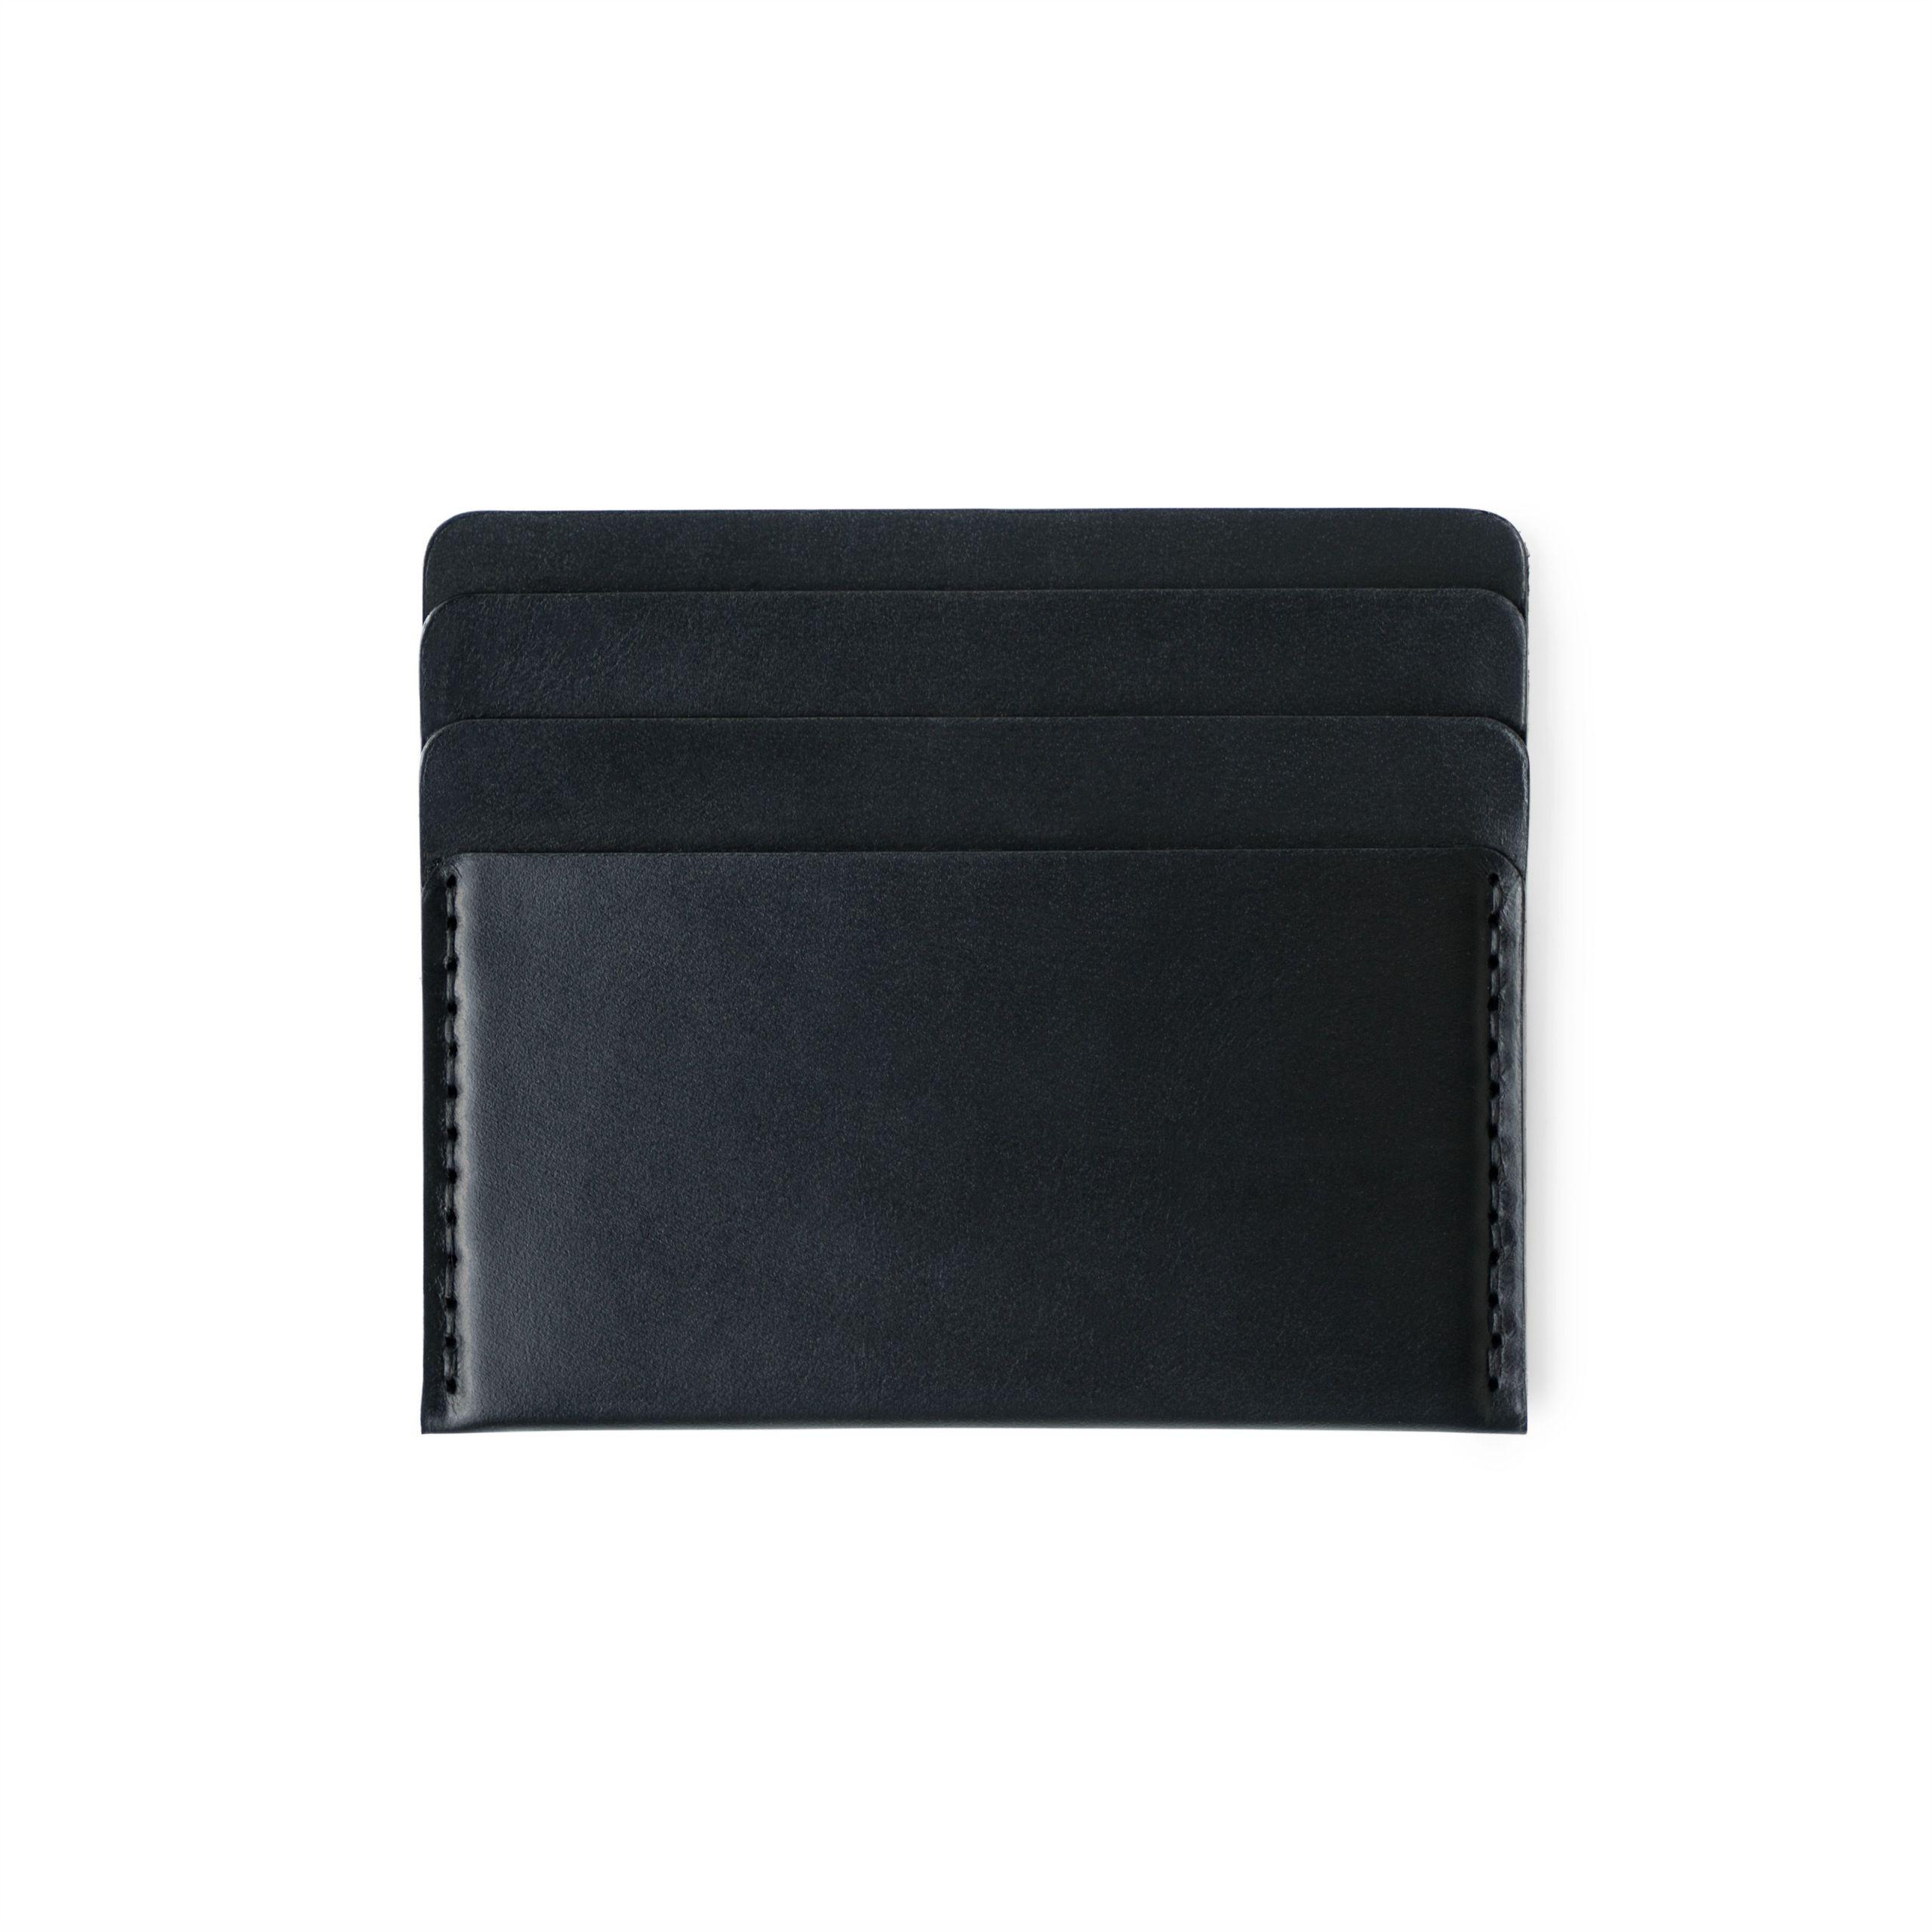 Cascade Wallet   Black Essex Horween Leather